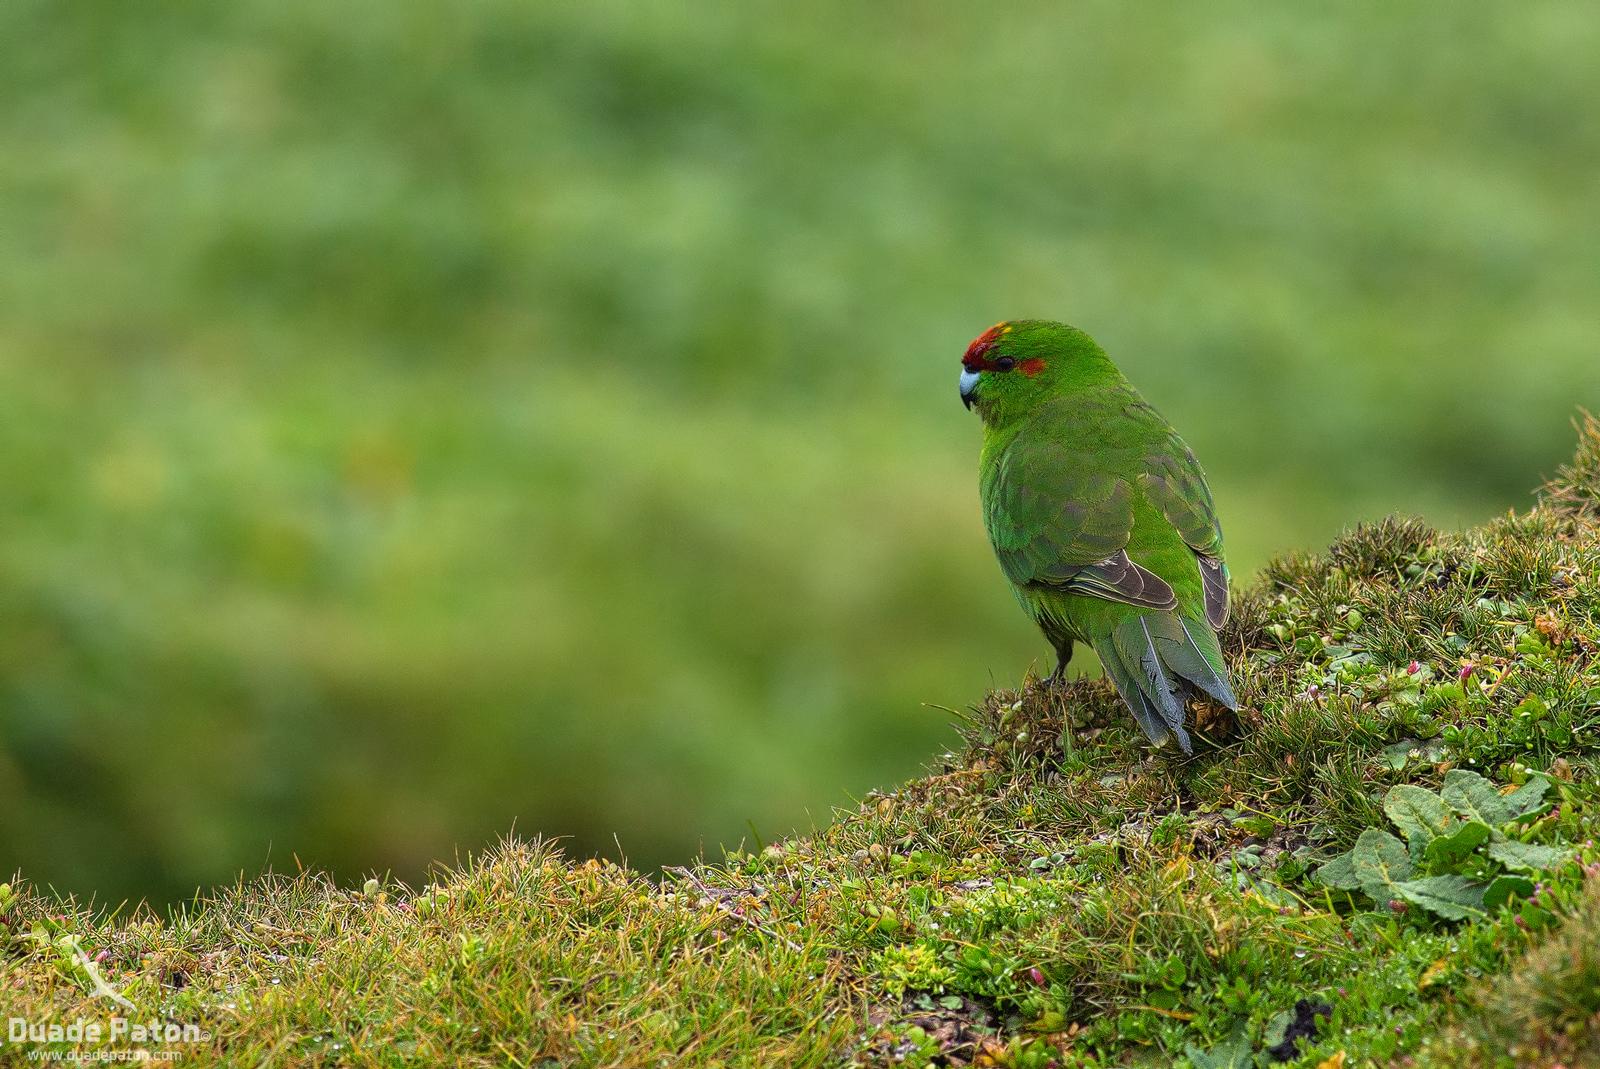 Red-crowned Parakeet